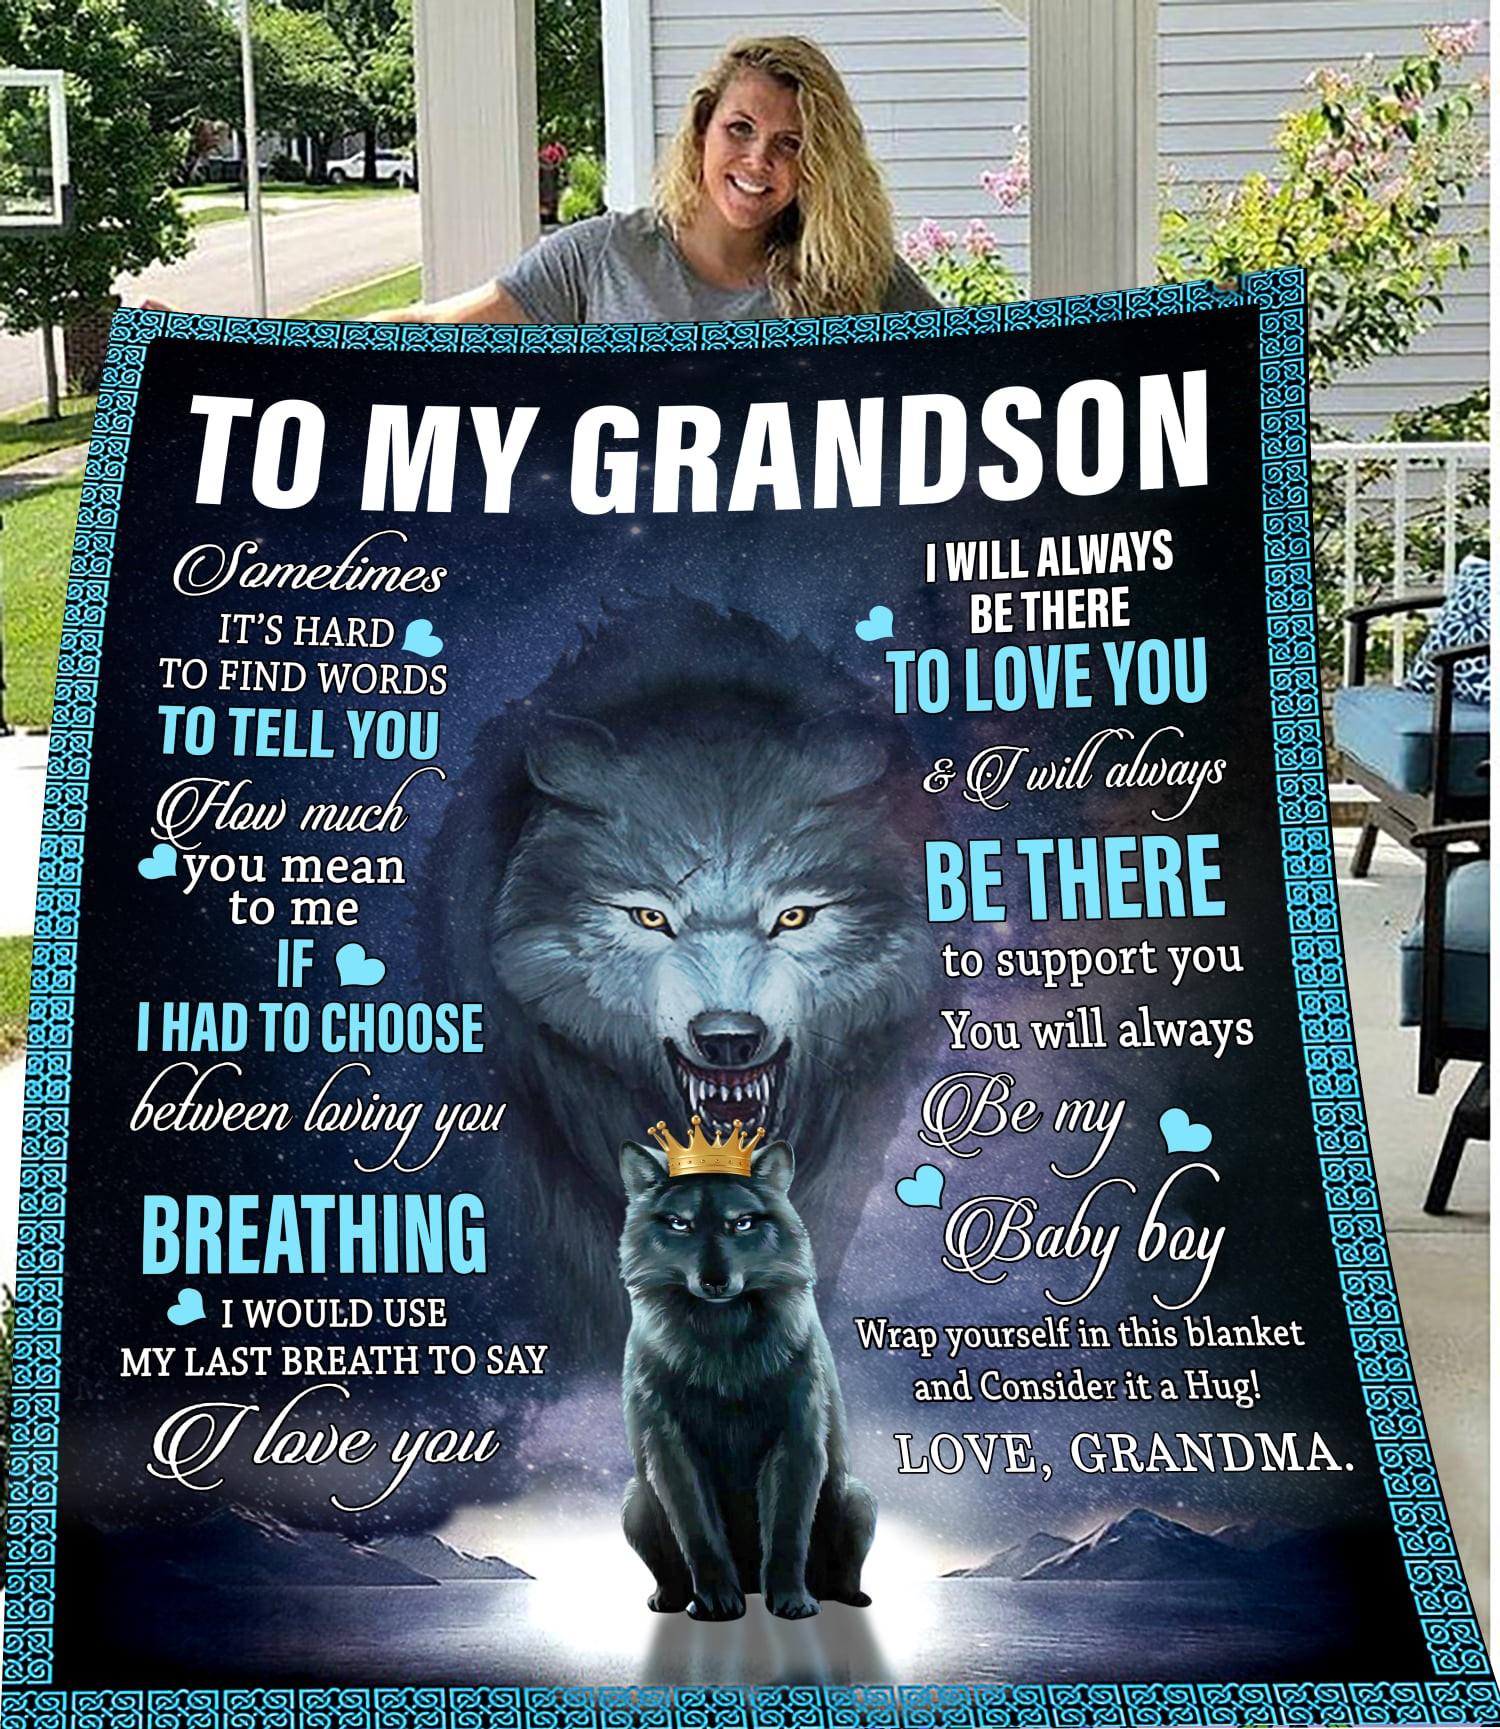 To My Grandson Quilt Blanket